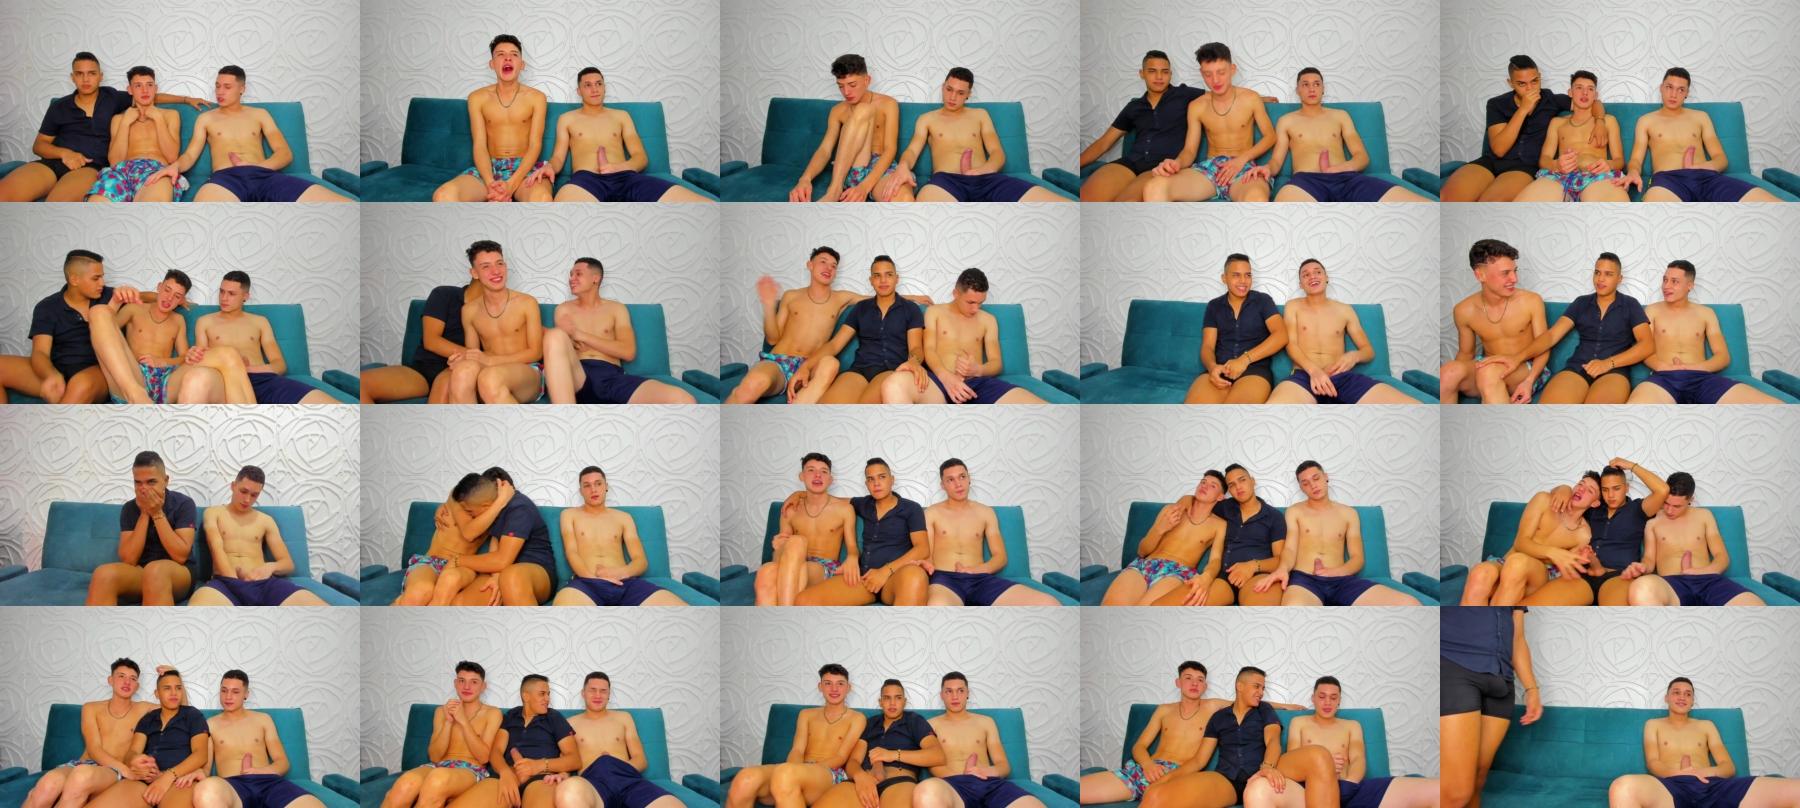 sweetorgasmfun Cam4 25-09-2021 Recorded Video Porn